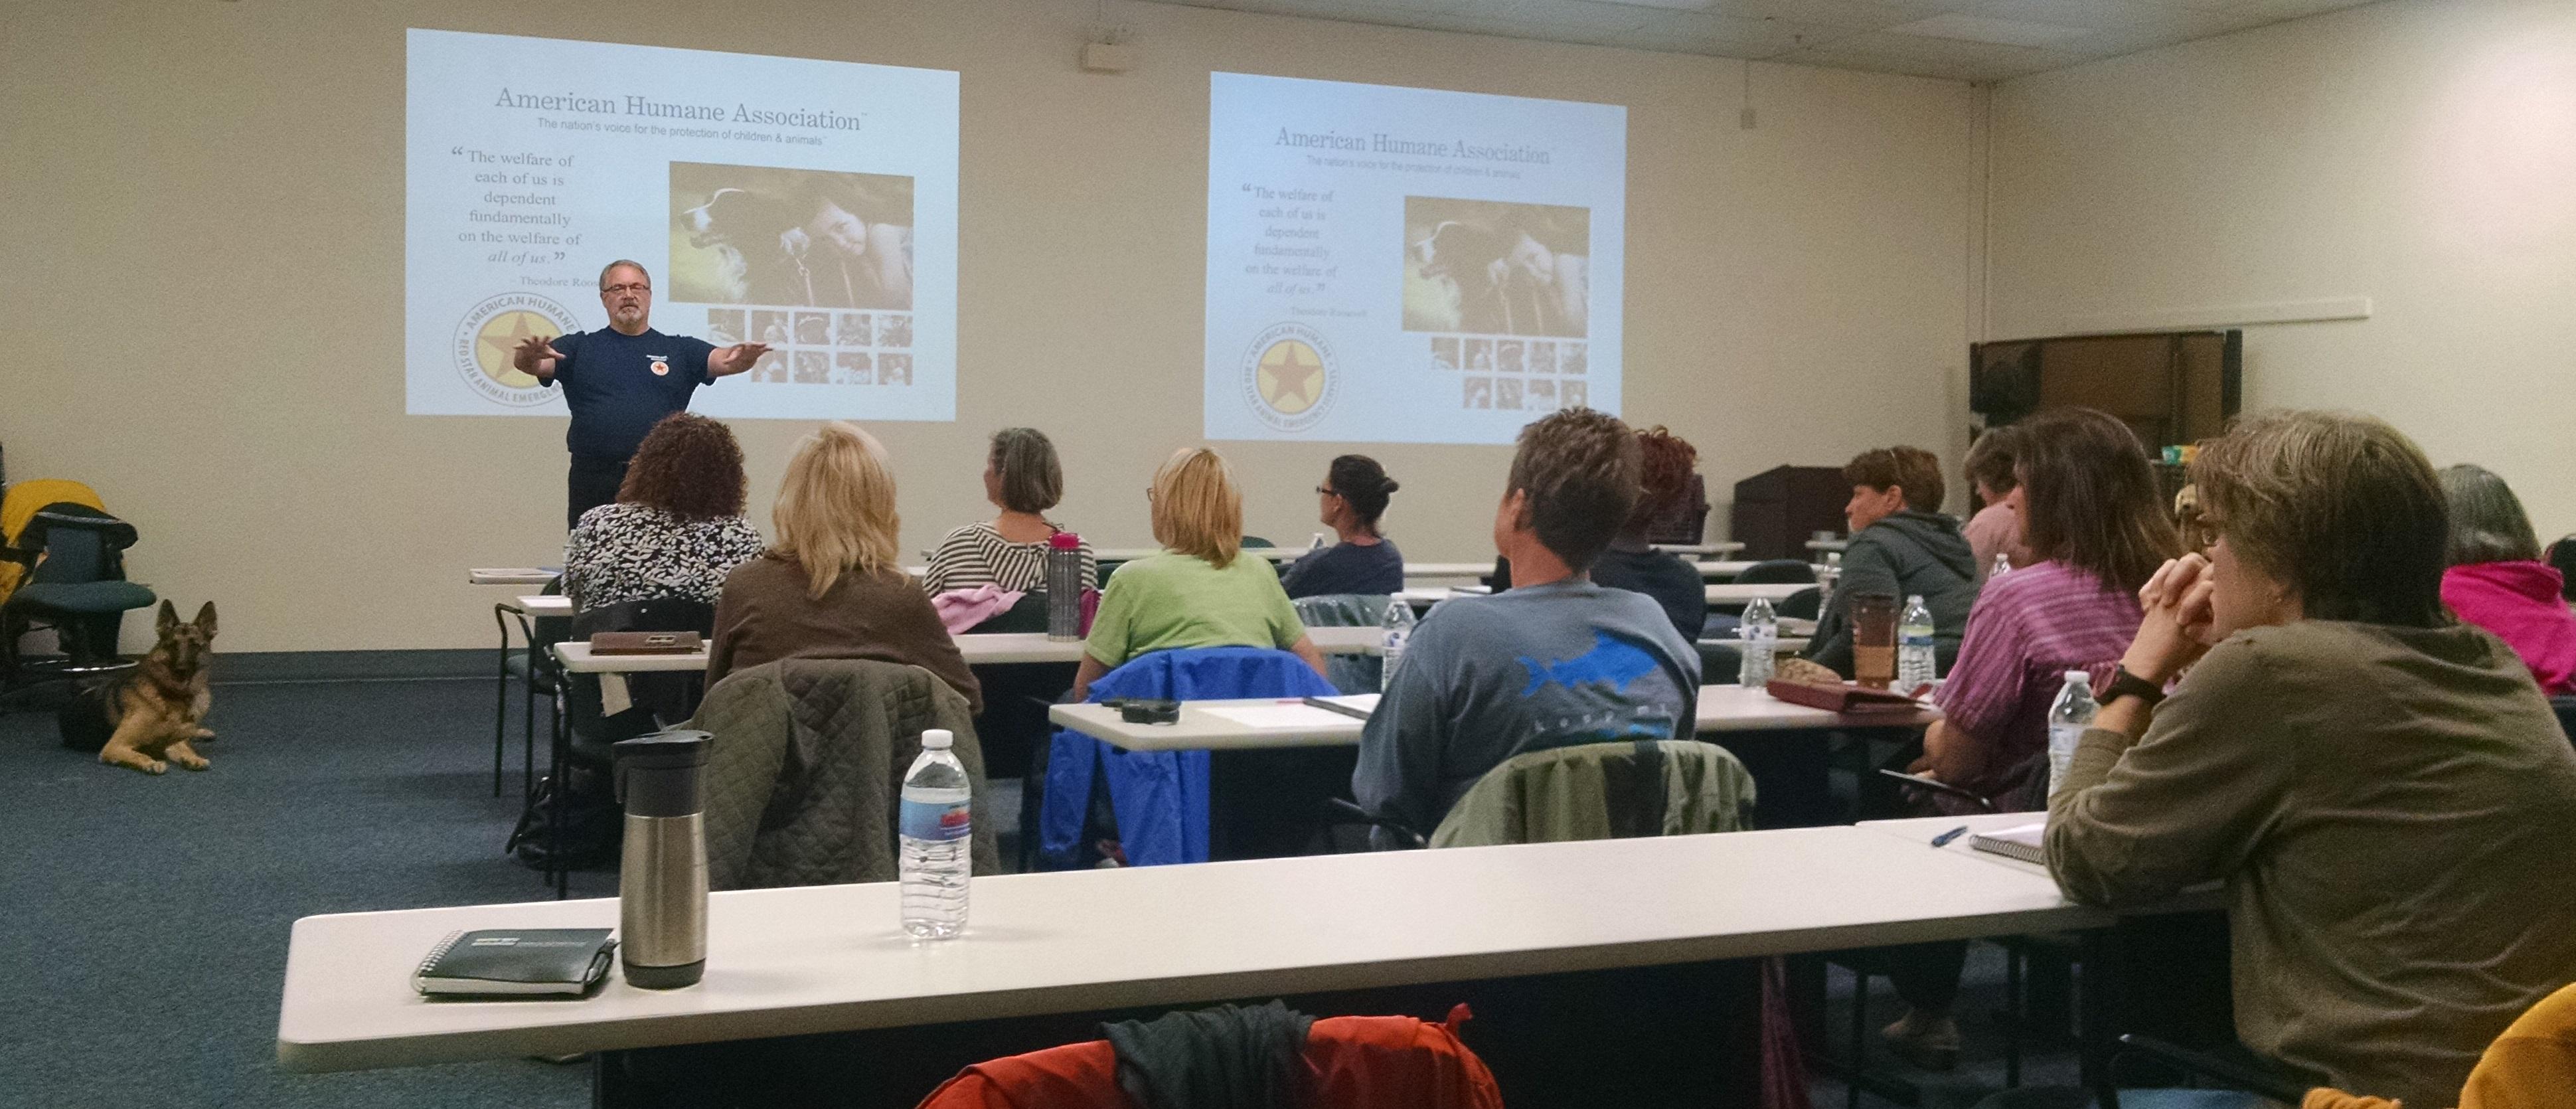 Office of Animal Welfare Hosts Training on Emergency